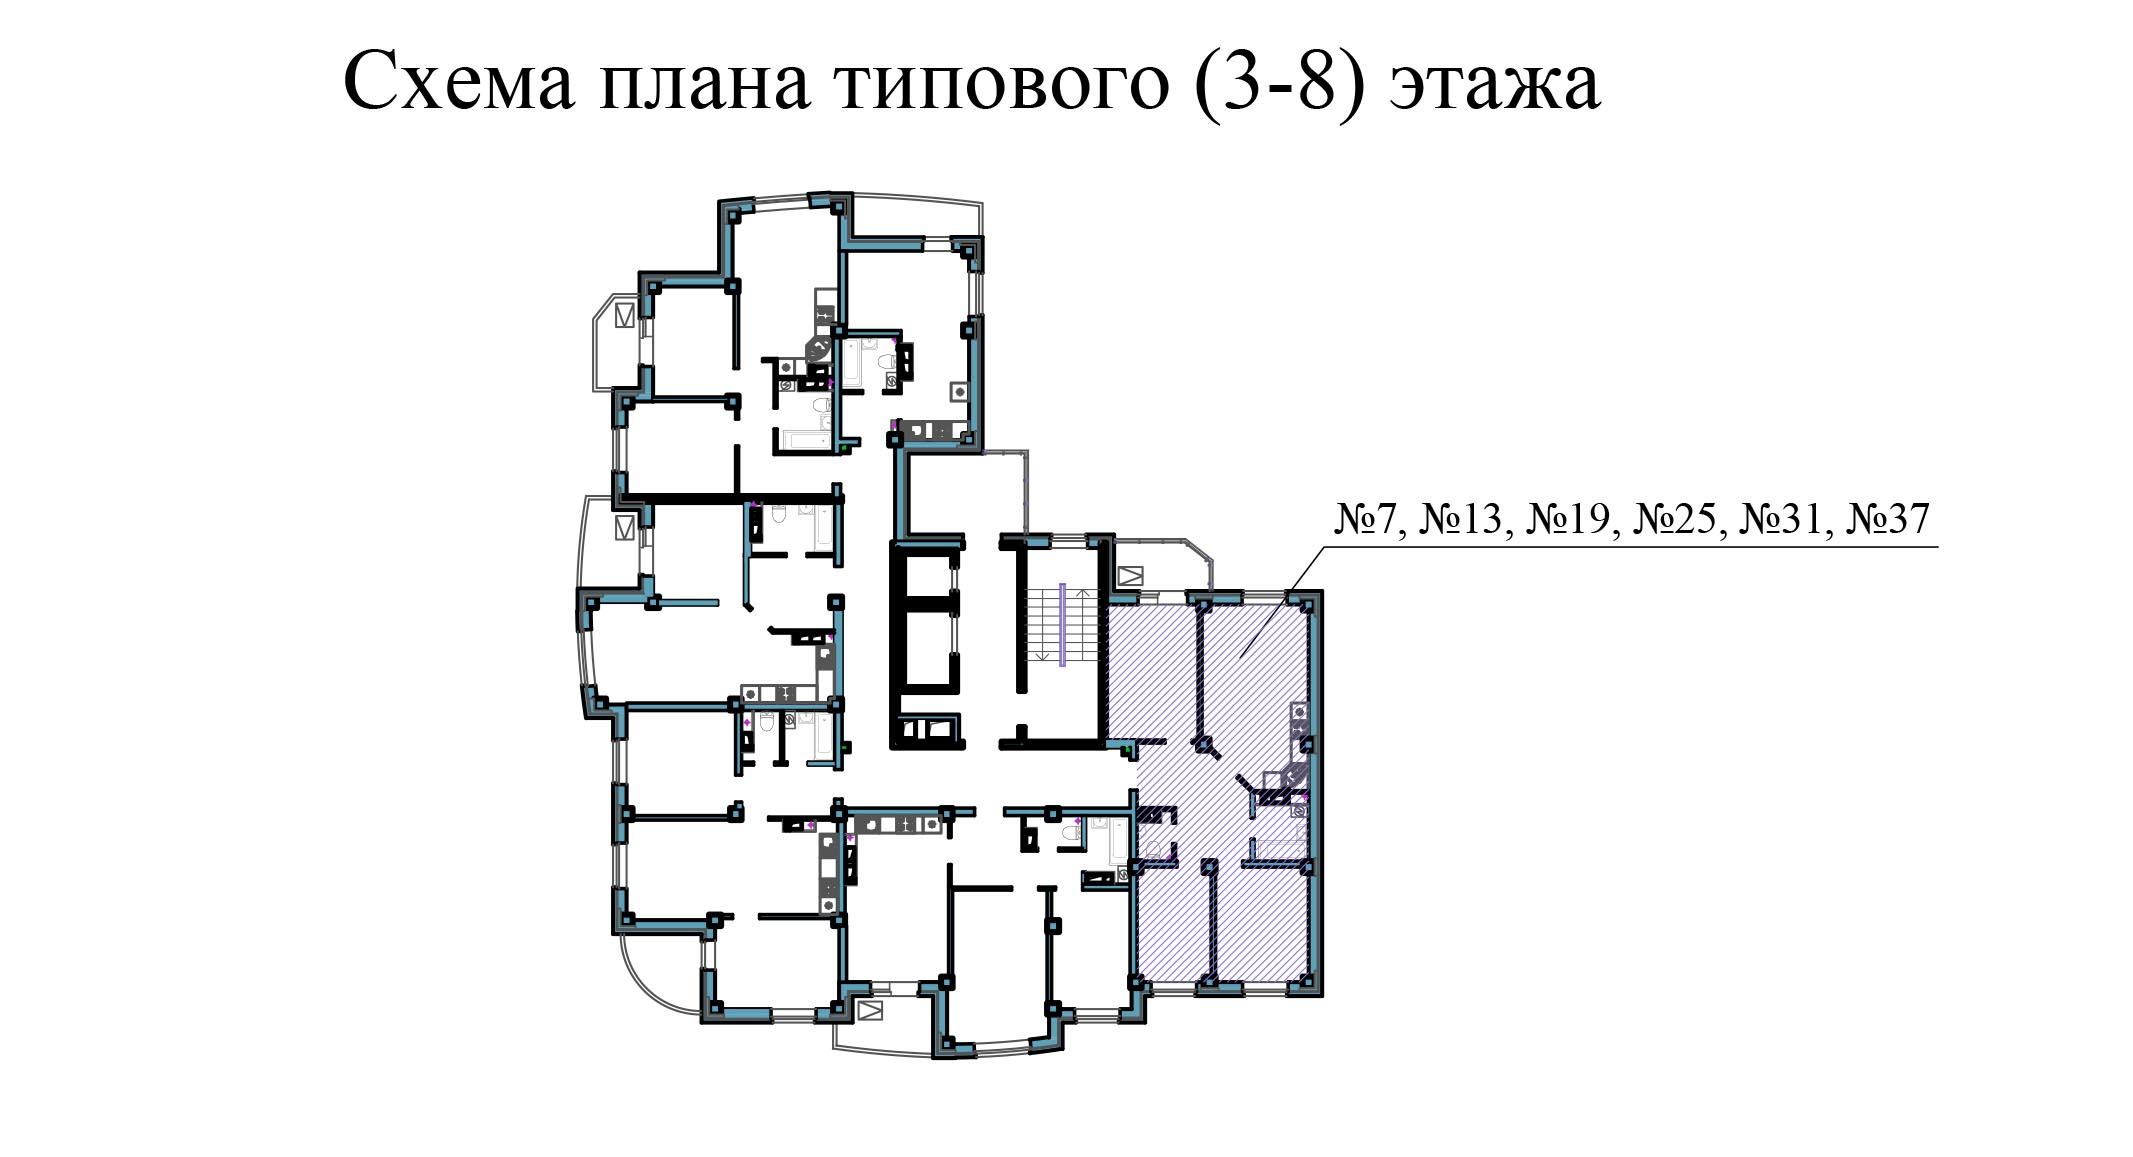 Трехкомнатная квартира - ул.Балтийская, д. 1а, кв. 13,19,31,37